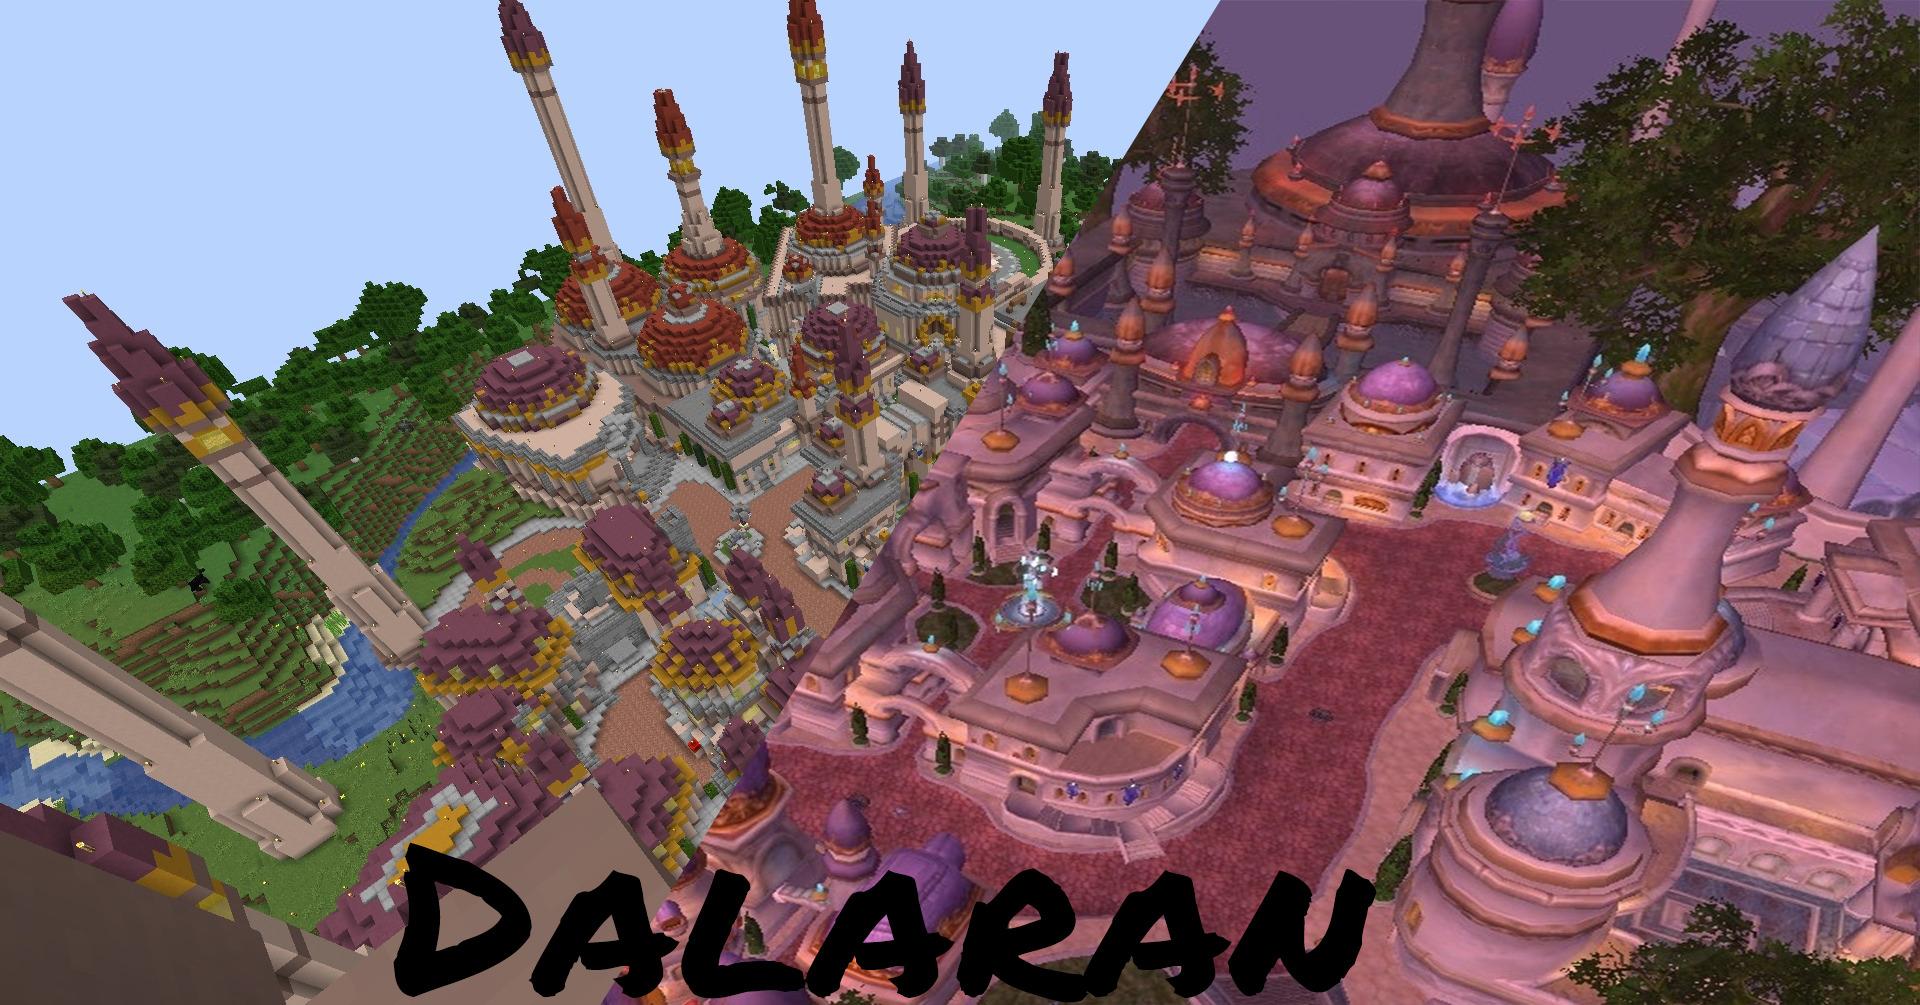 Redditor LapisBroSammy Has Recreated Dalaran In Survival Minecraft, Creating WoW In Minecraft